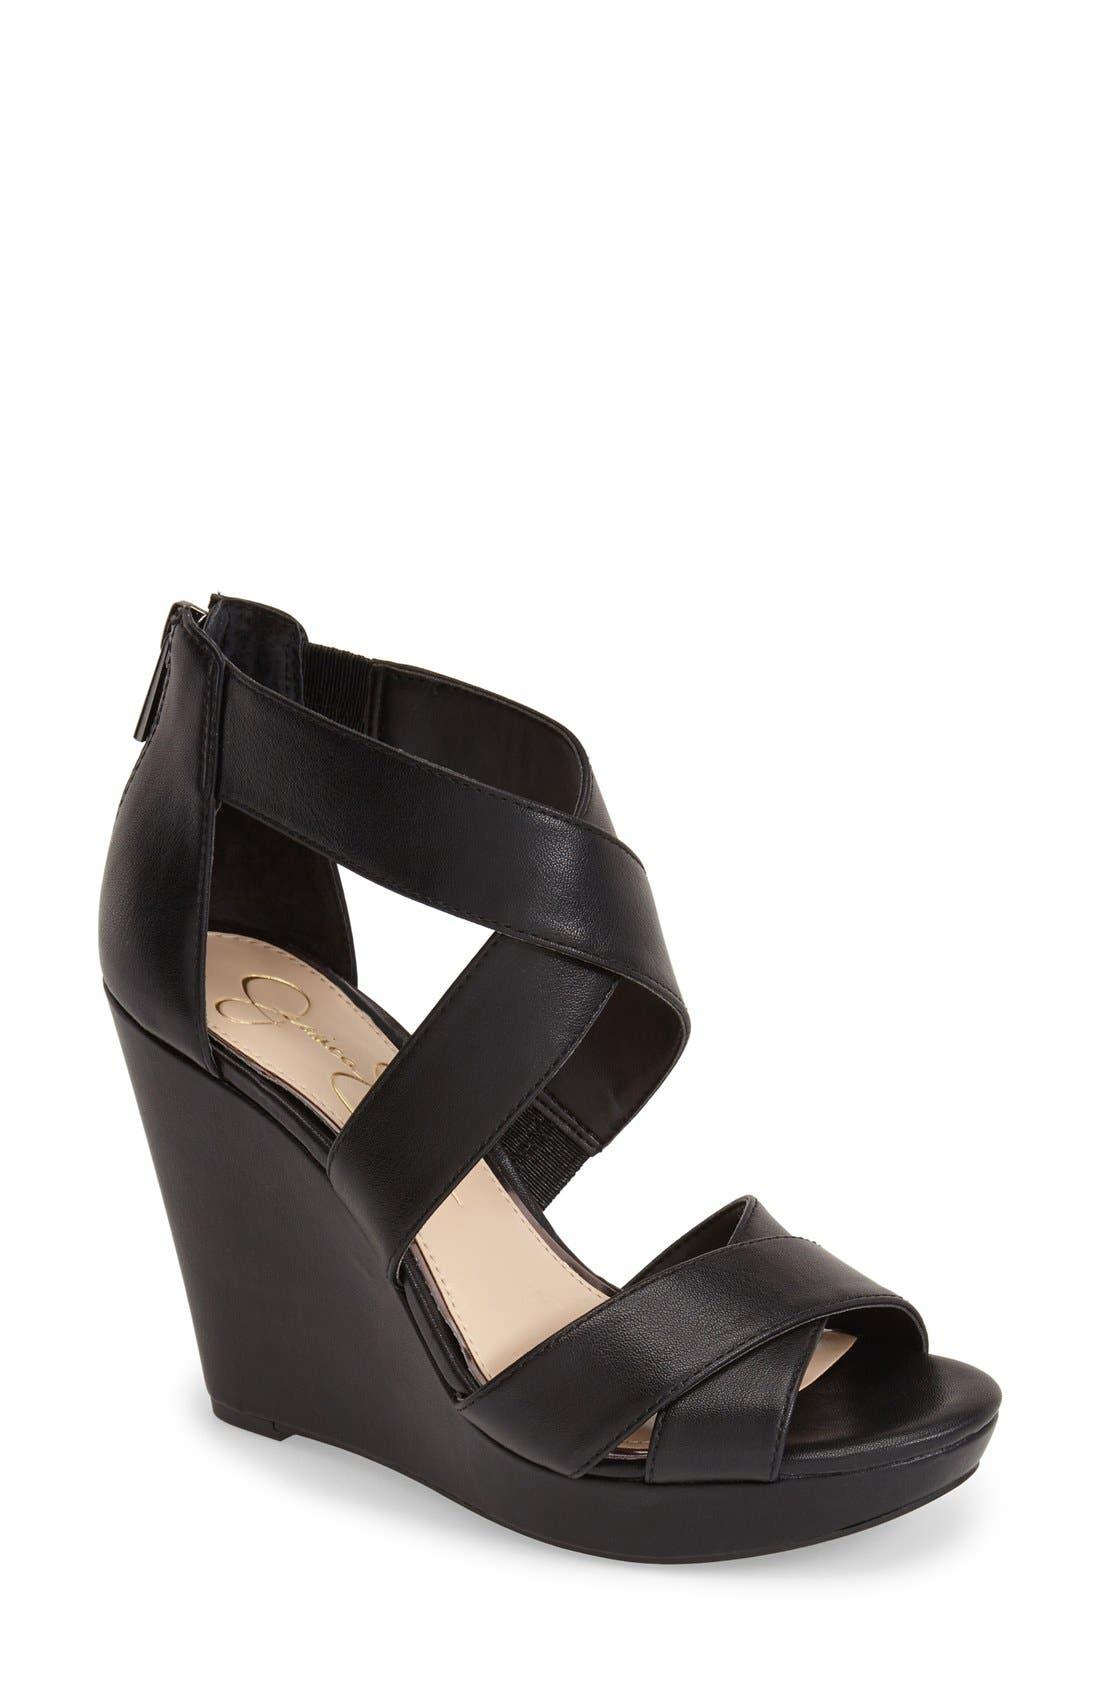 'Jadyn' Strappy Wedge Sandal,                         Main,                         color, 001